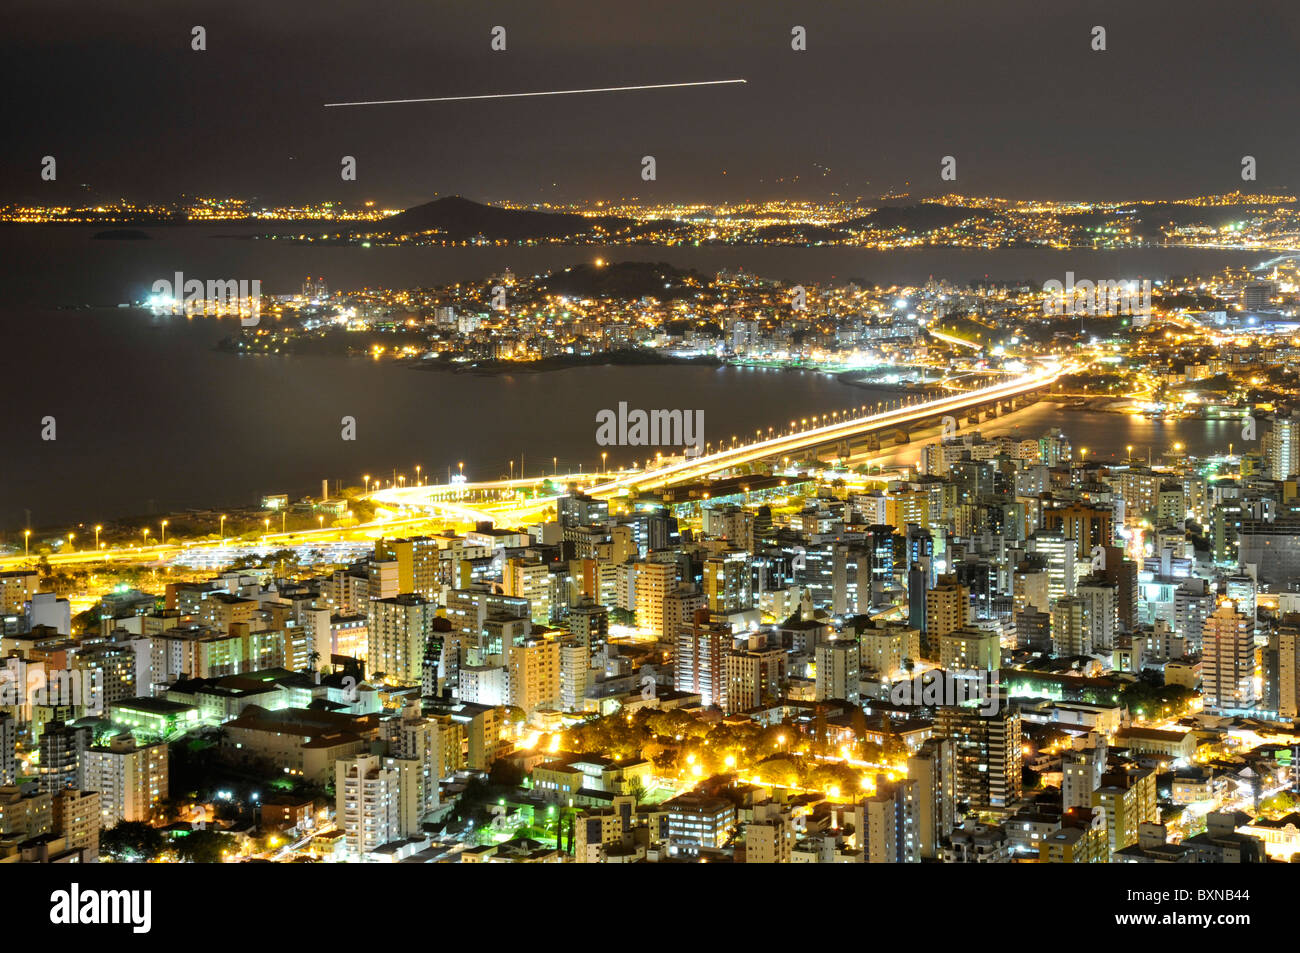 Connection between Florianopolis Island and mainland, night view, Santa Catarina, Brazil - Stock Image